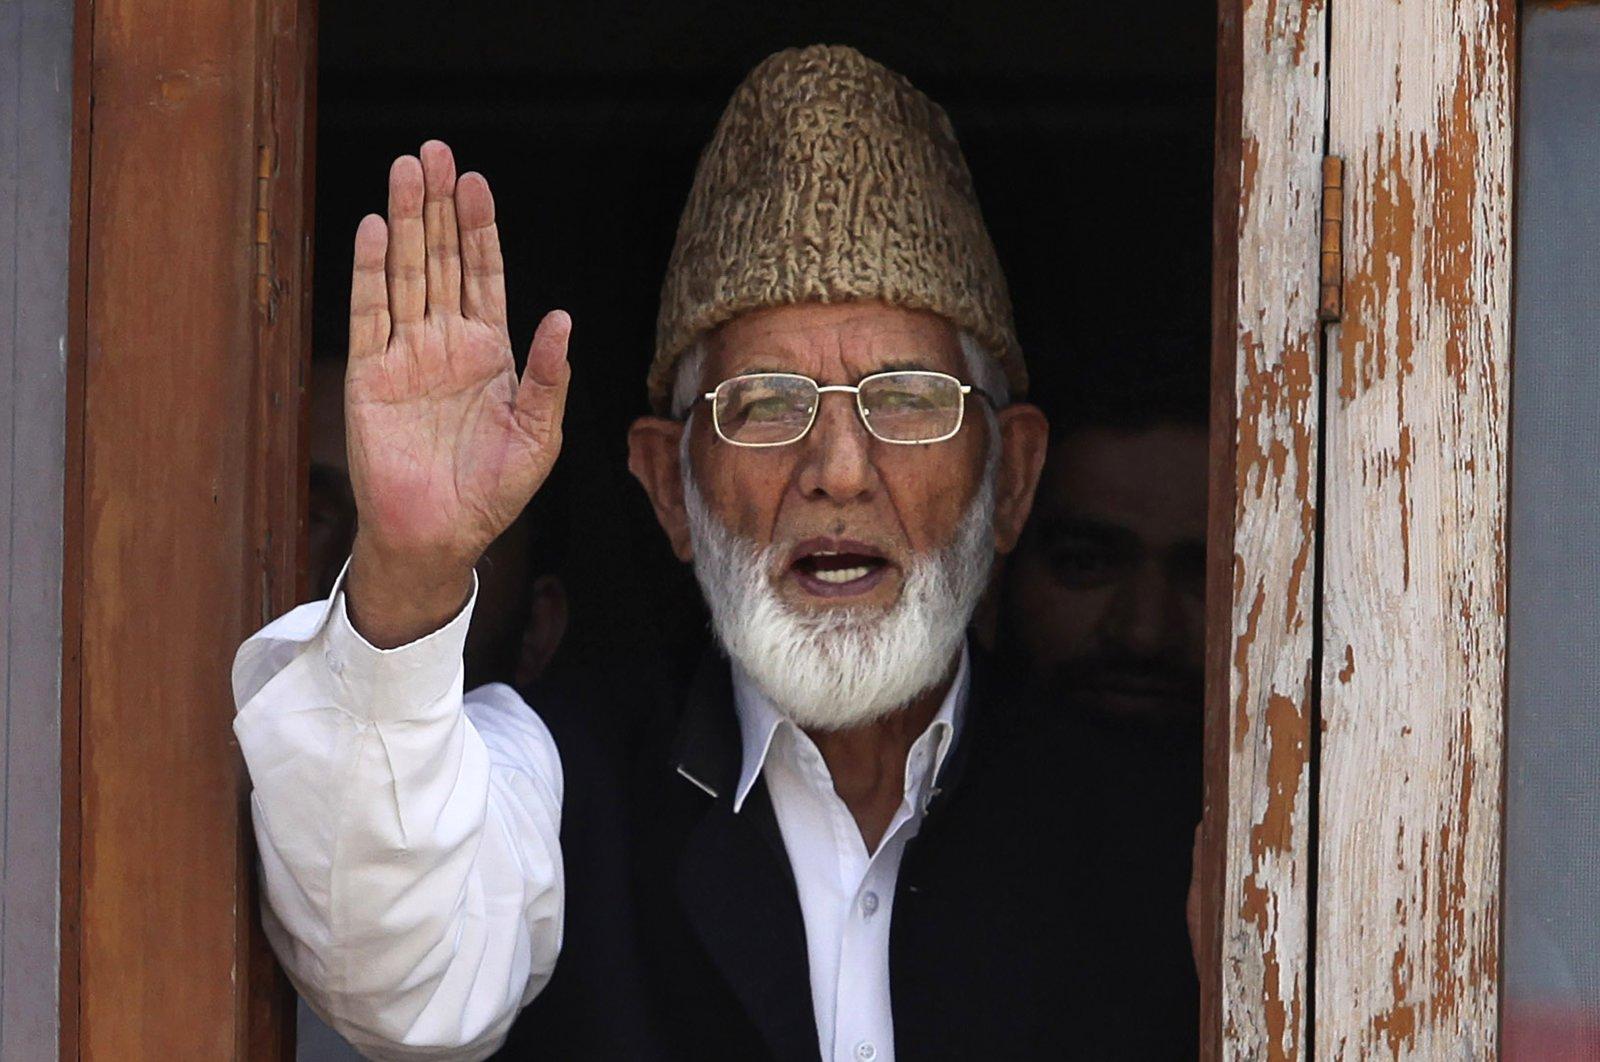 Kashmiri separatist leader Syed Ali Shah Geelani waves to the media before his arrest in Srinagar, India, Sept. 8, 2010. (AP Photo)